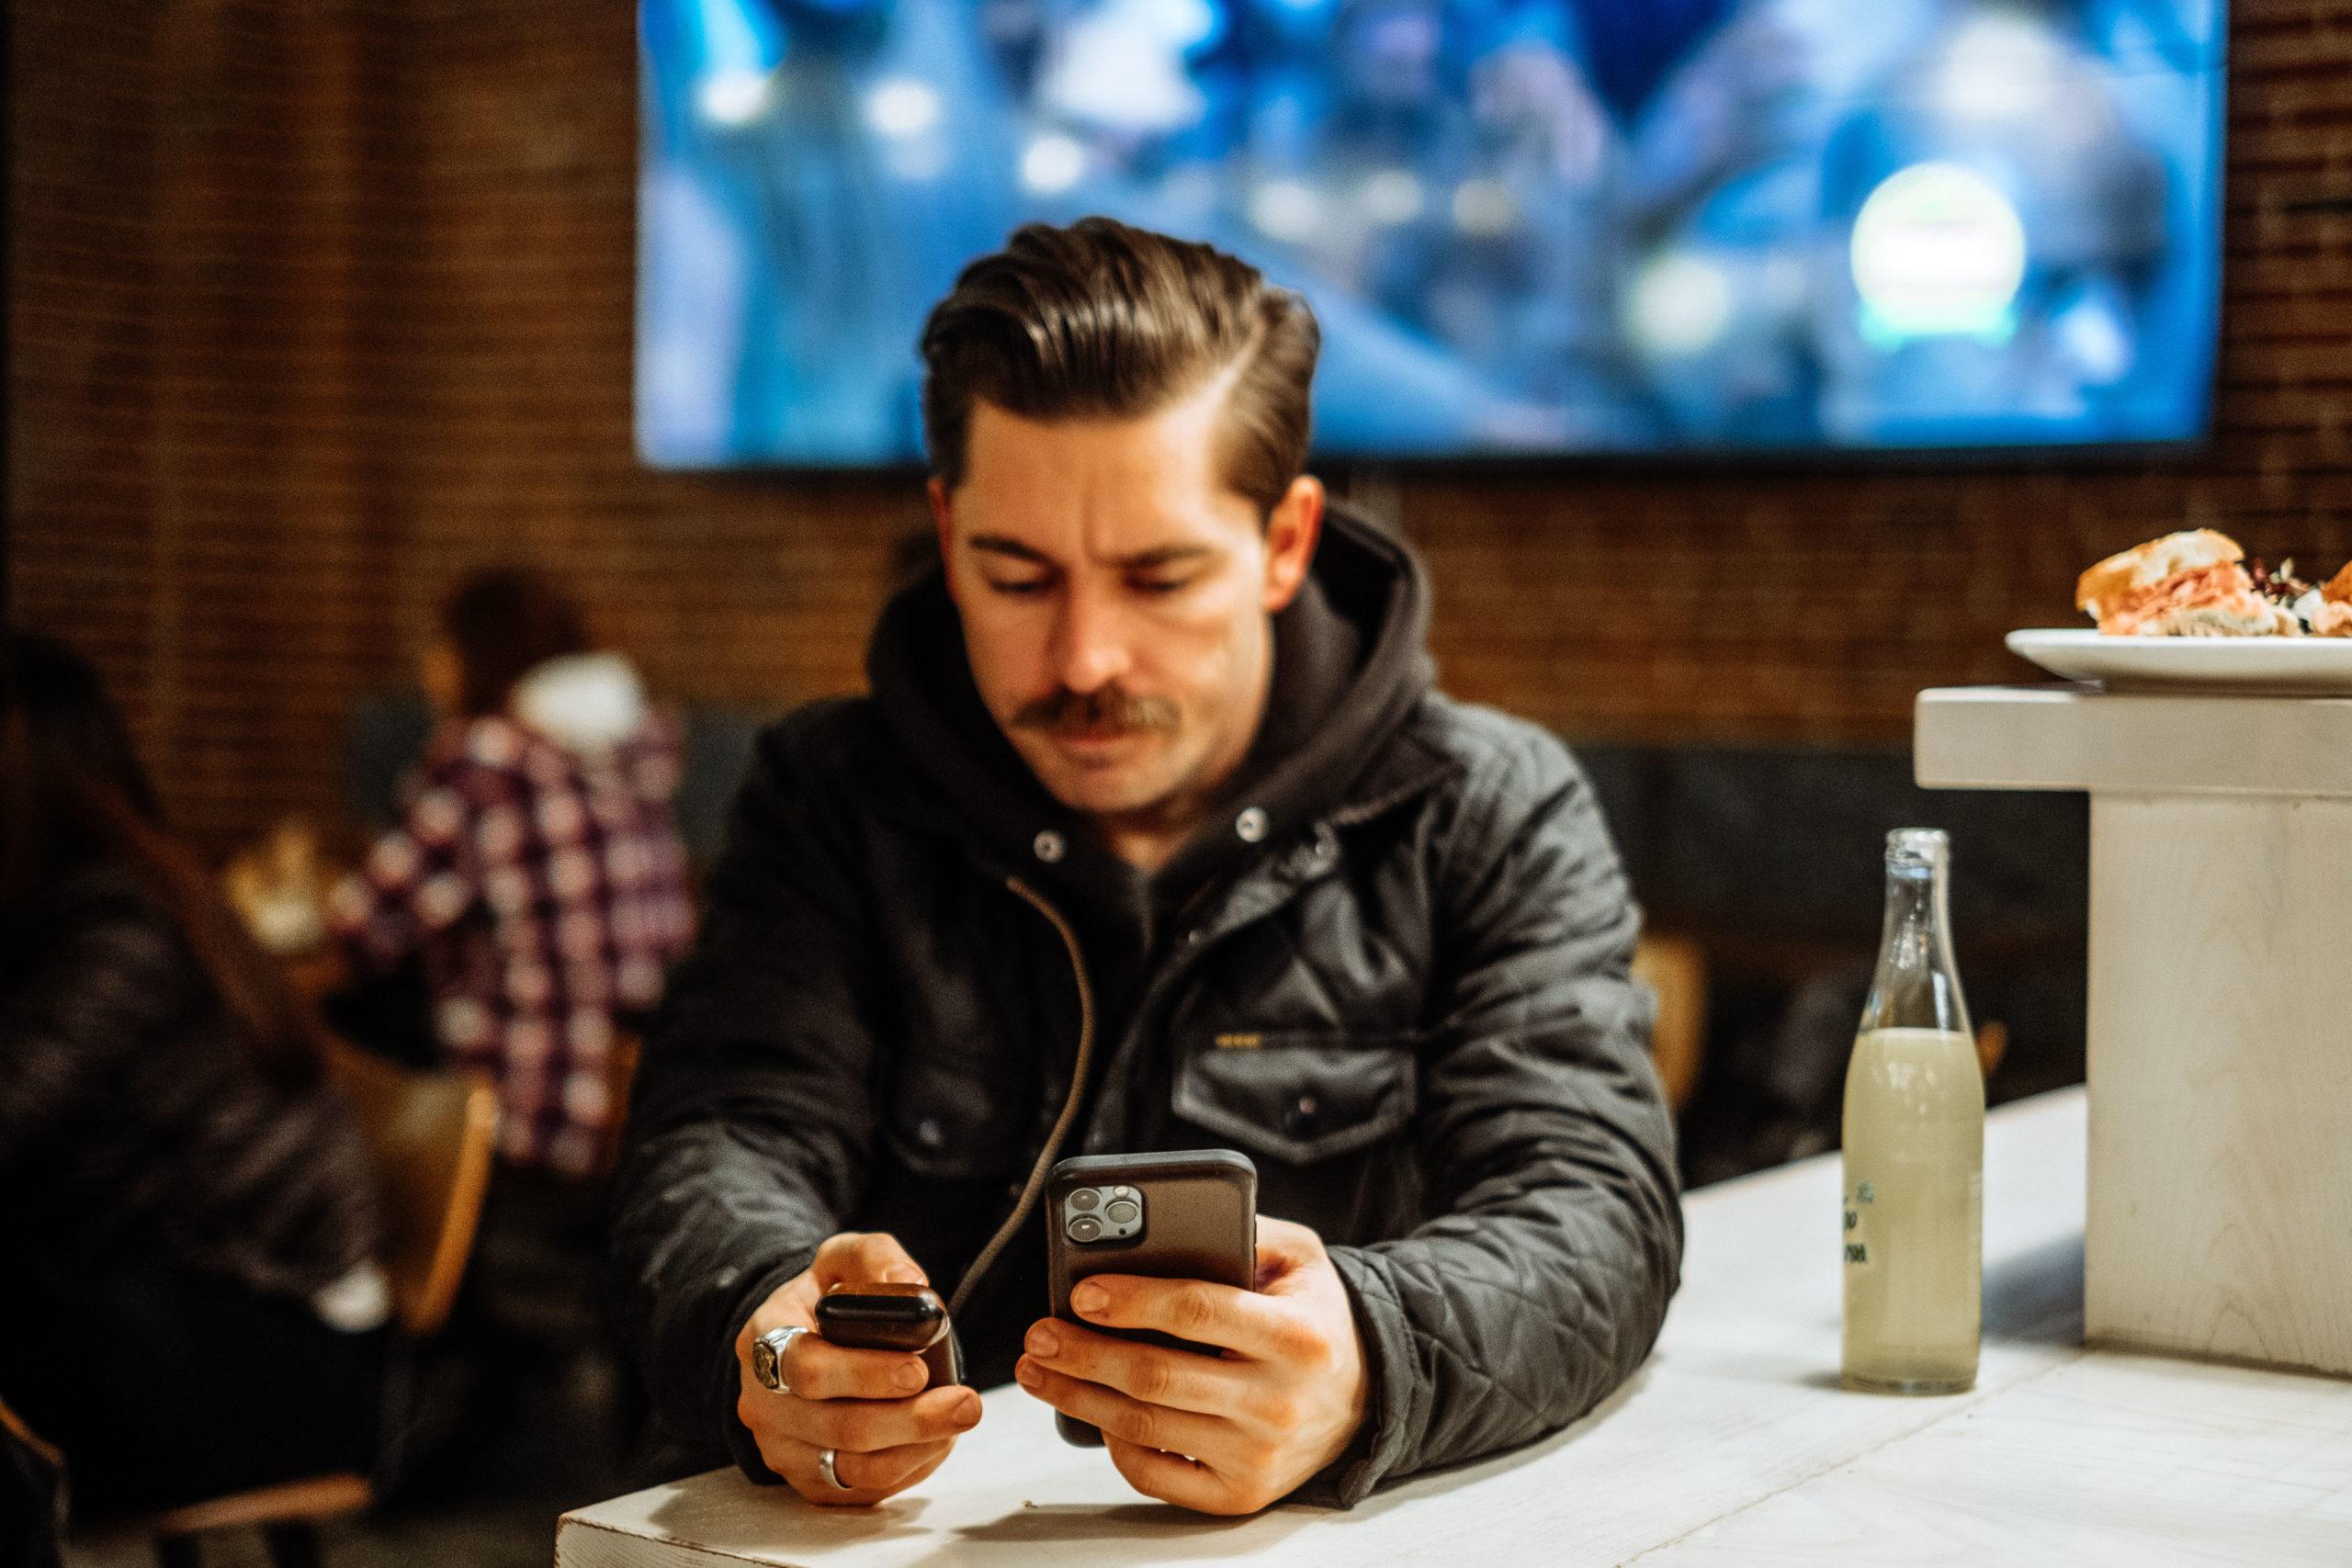 Man Using AudioFetch App in Sports Bar